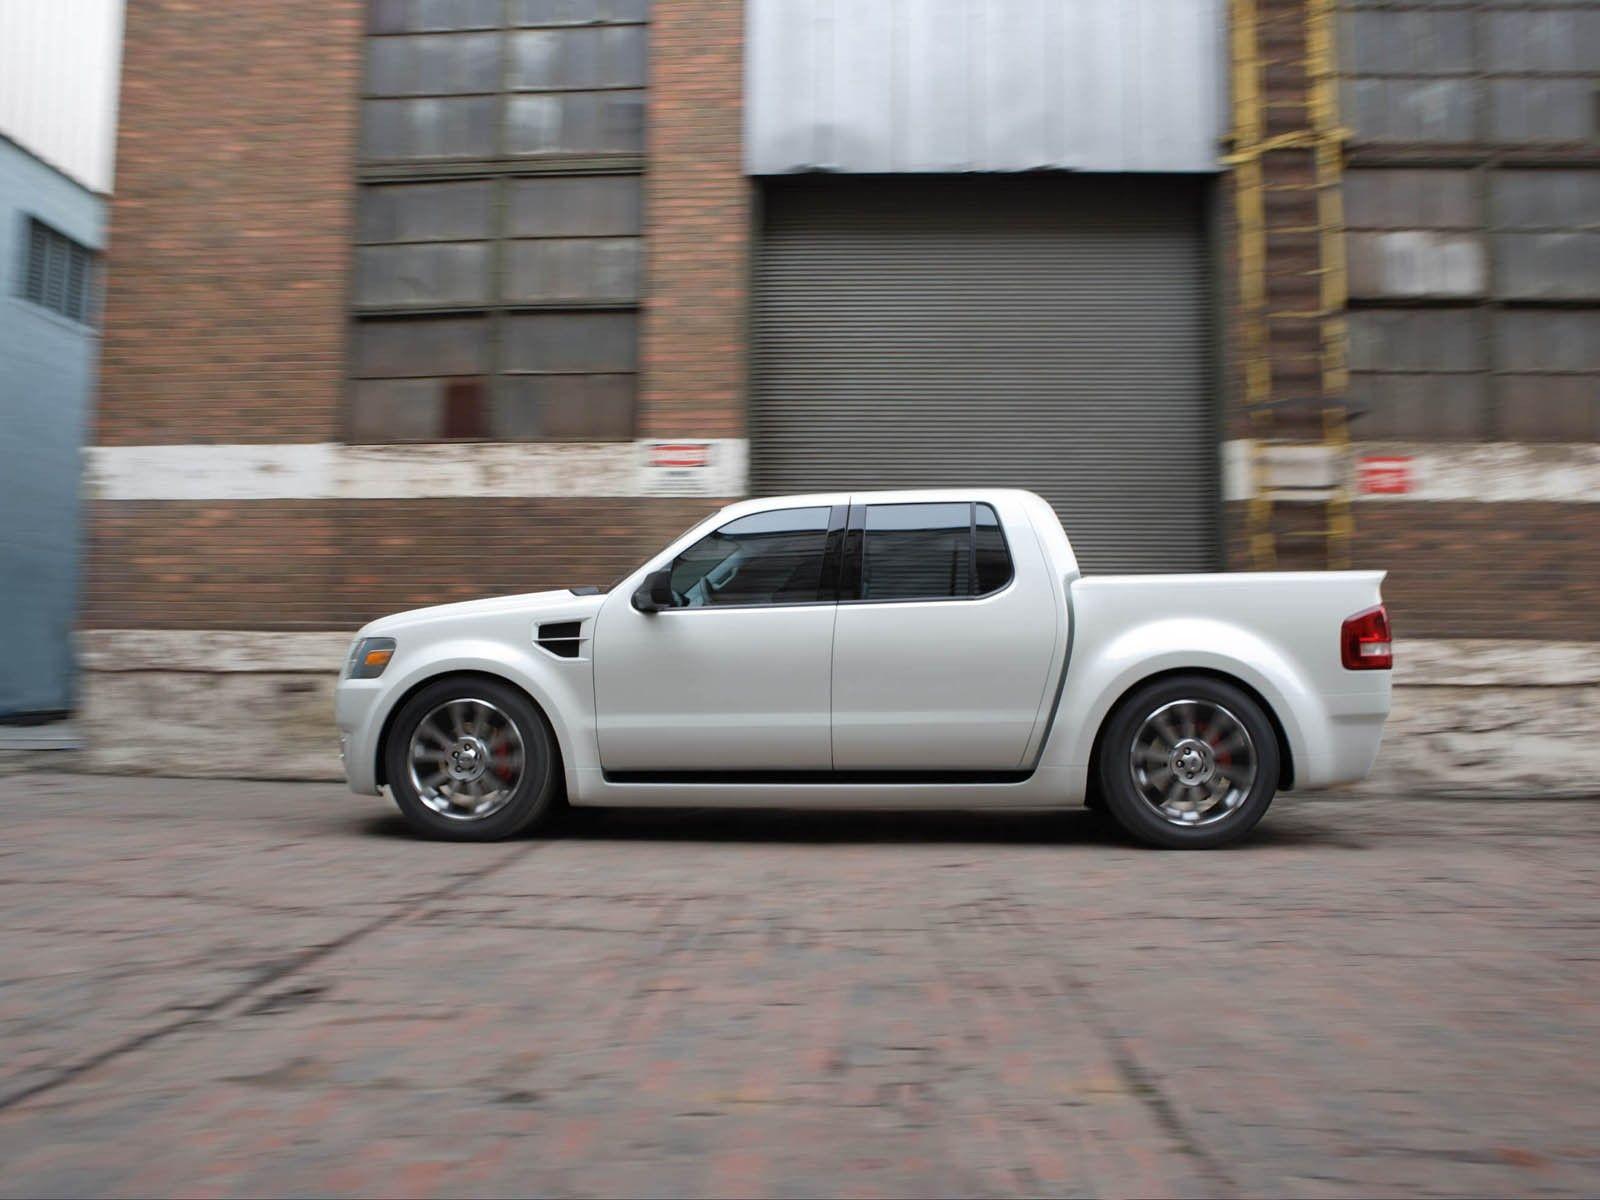 2010 Ford Sport Trac.. Ford explorer sport, Sport trac